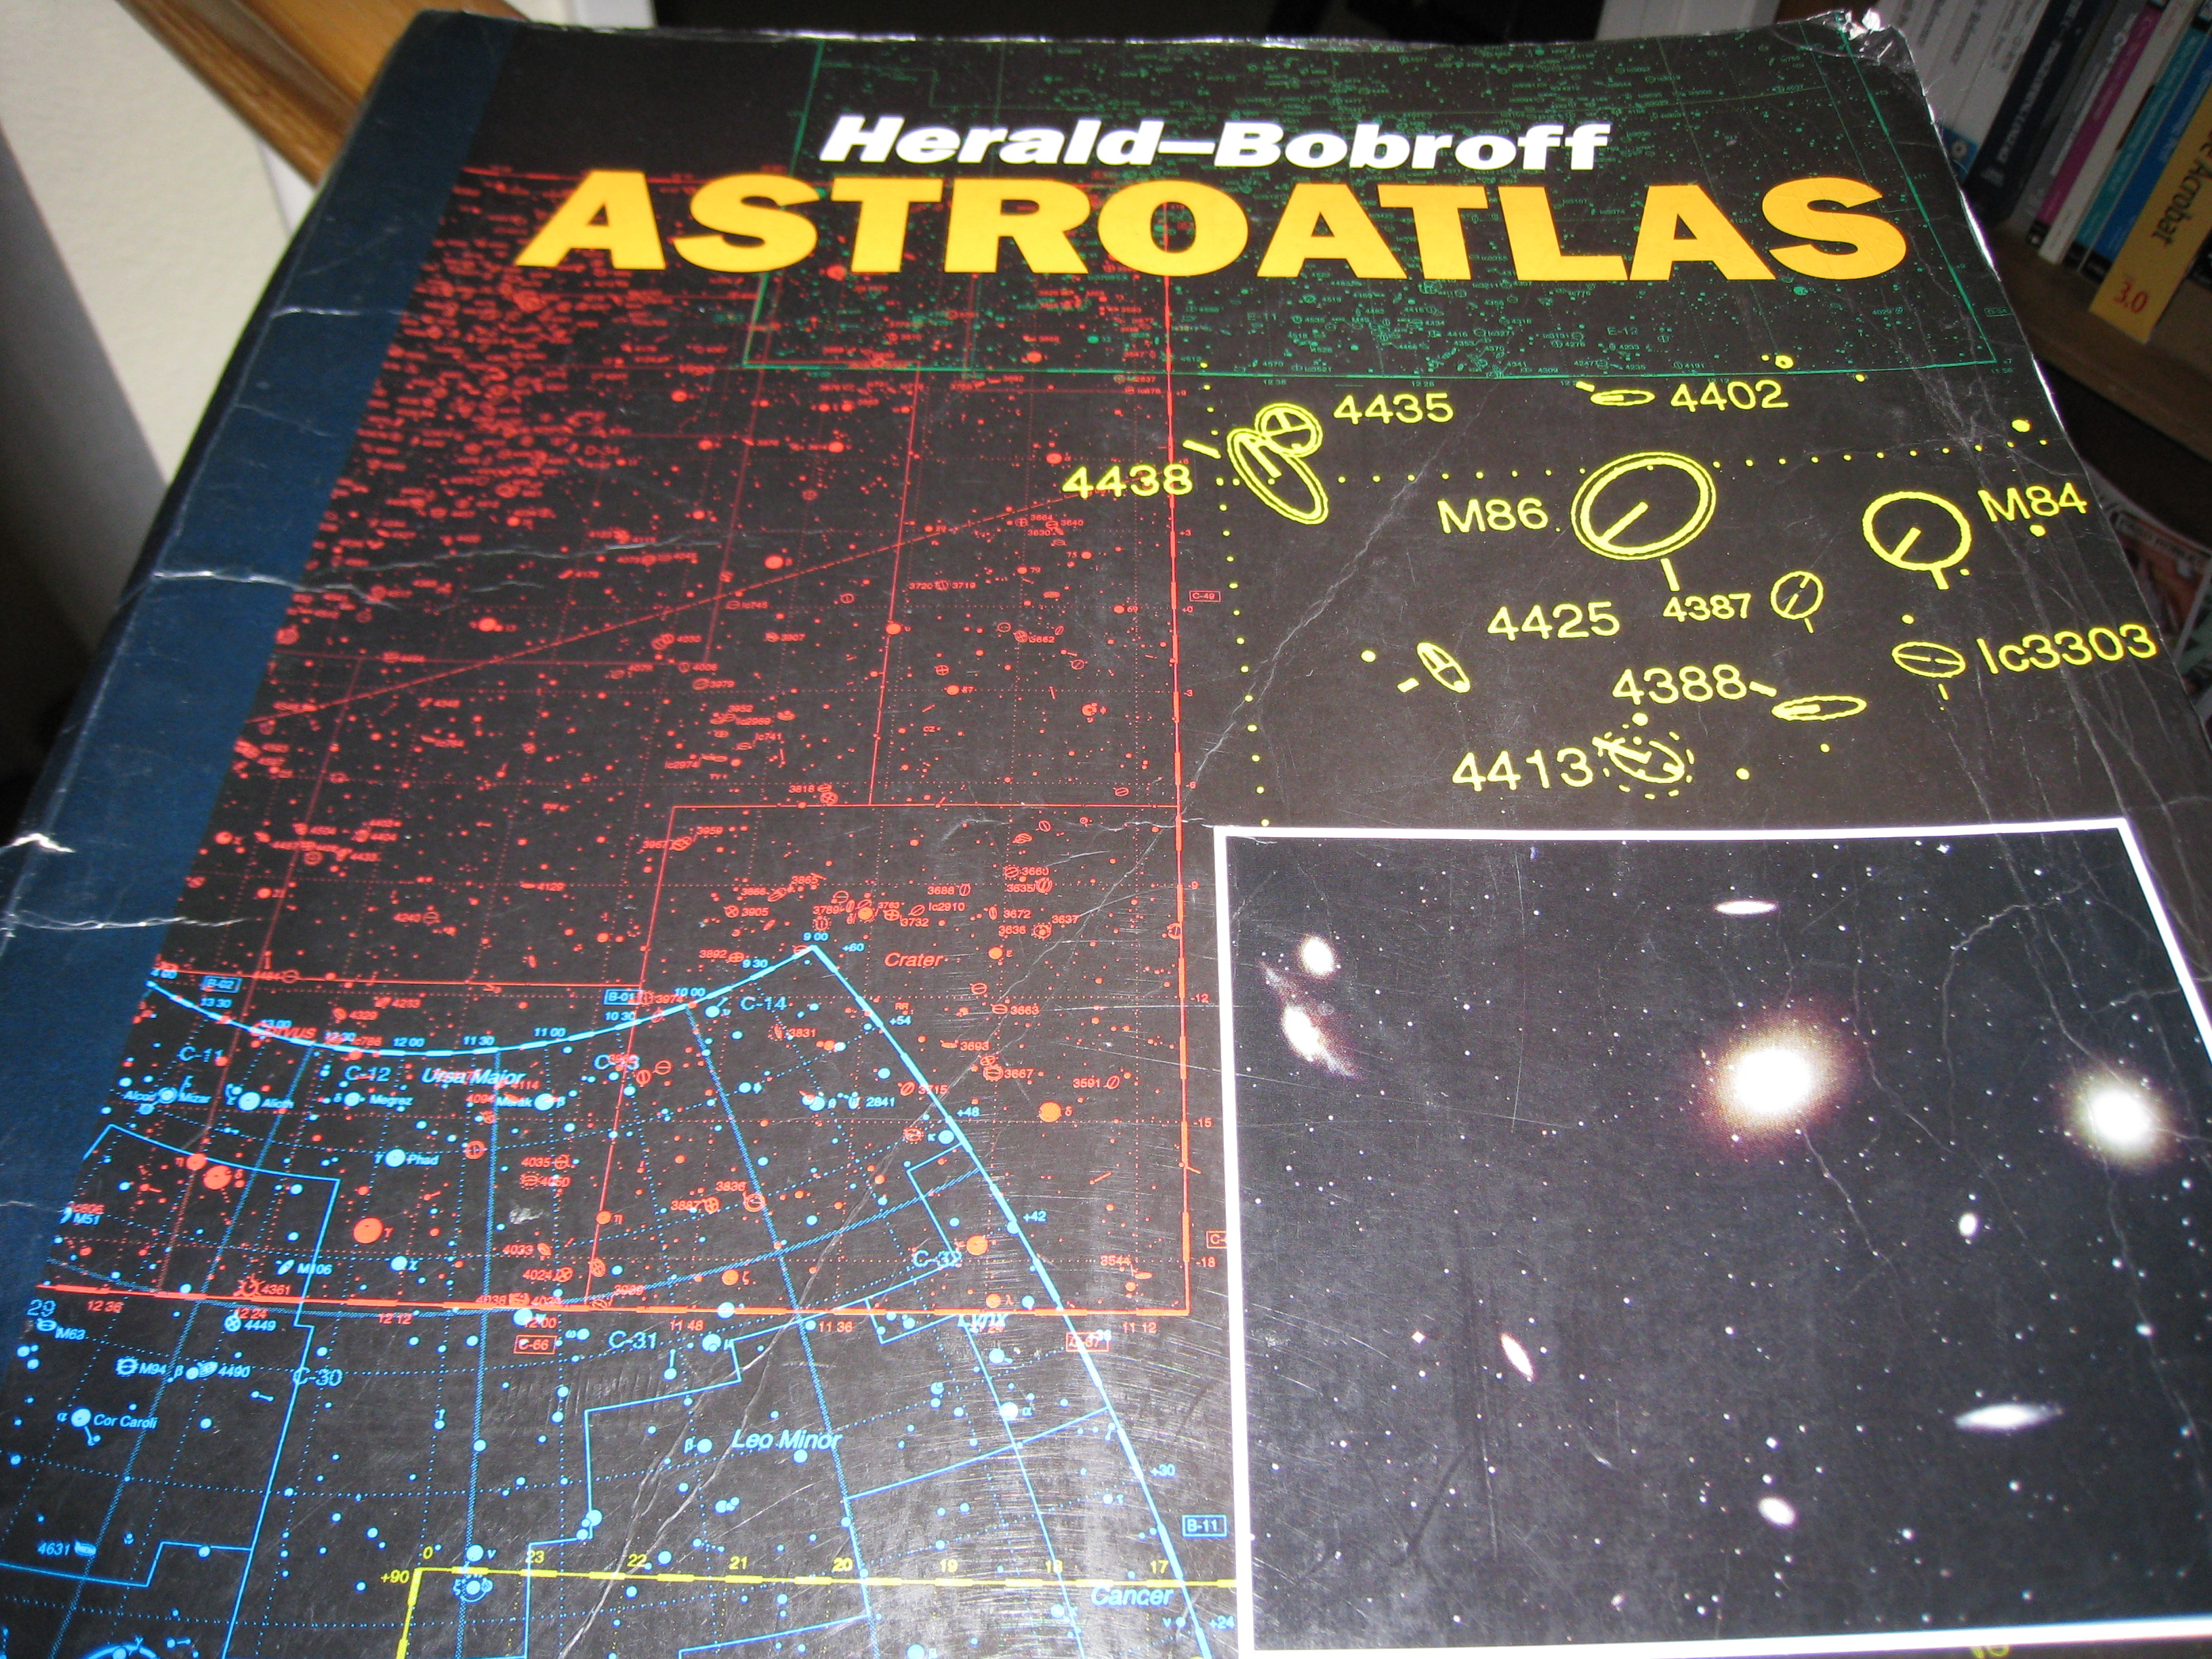 Herald-Bobroff Astroatlas